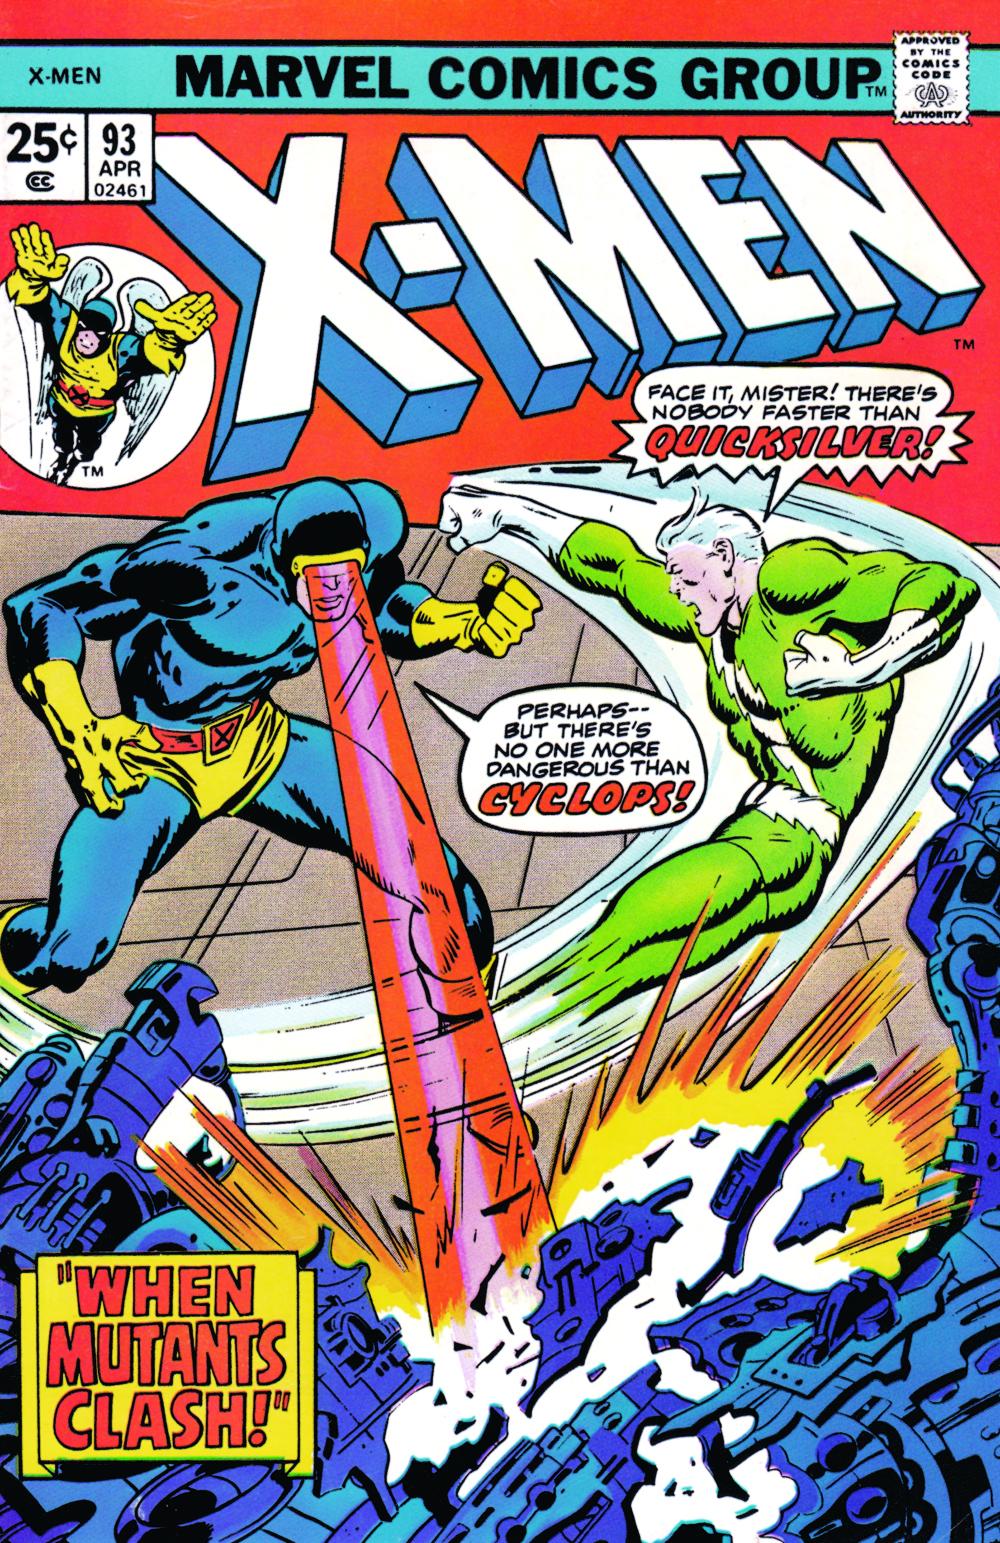 Uncanny X-Men (1963) #93